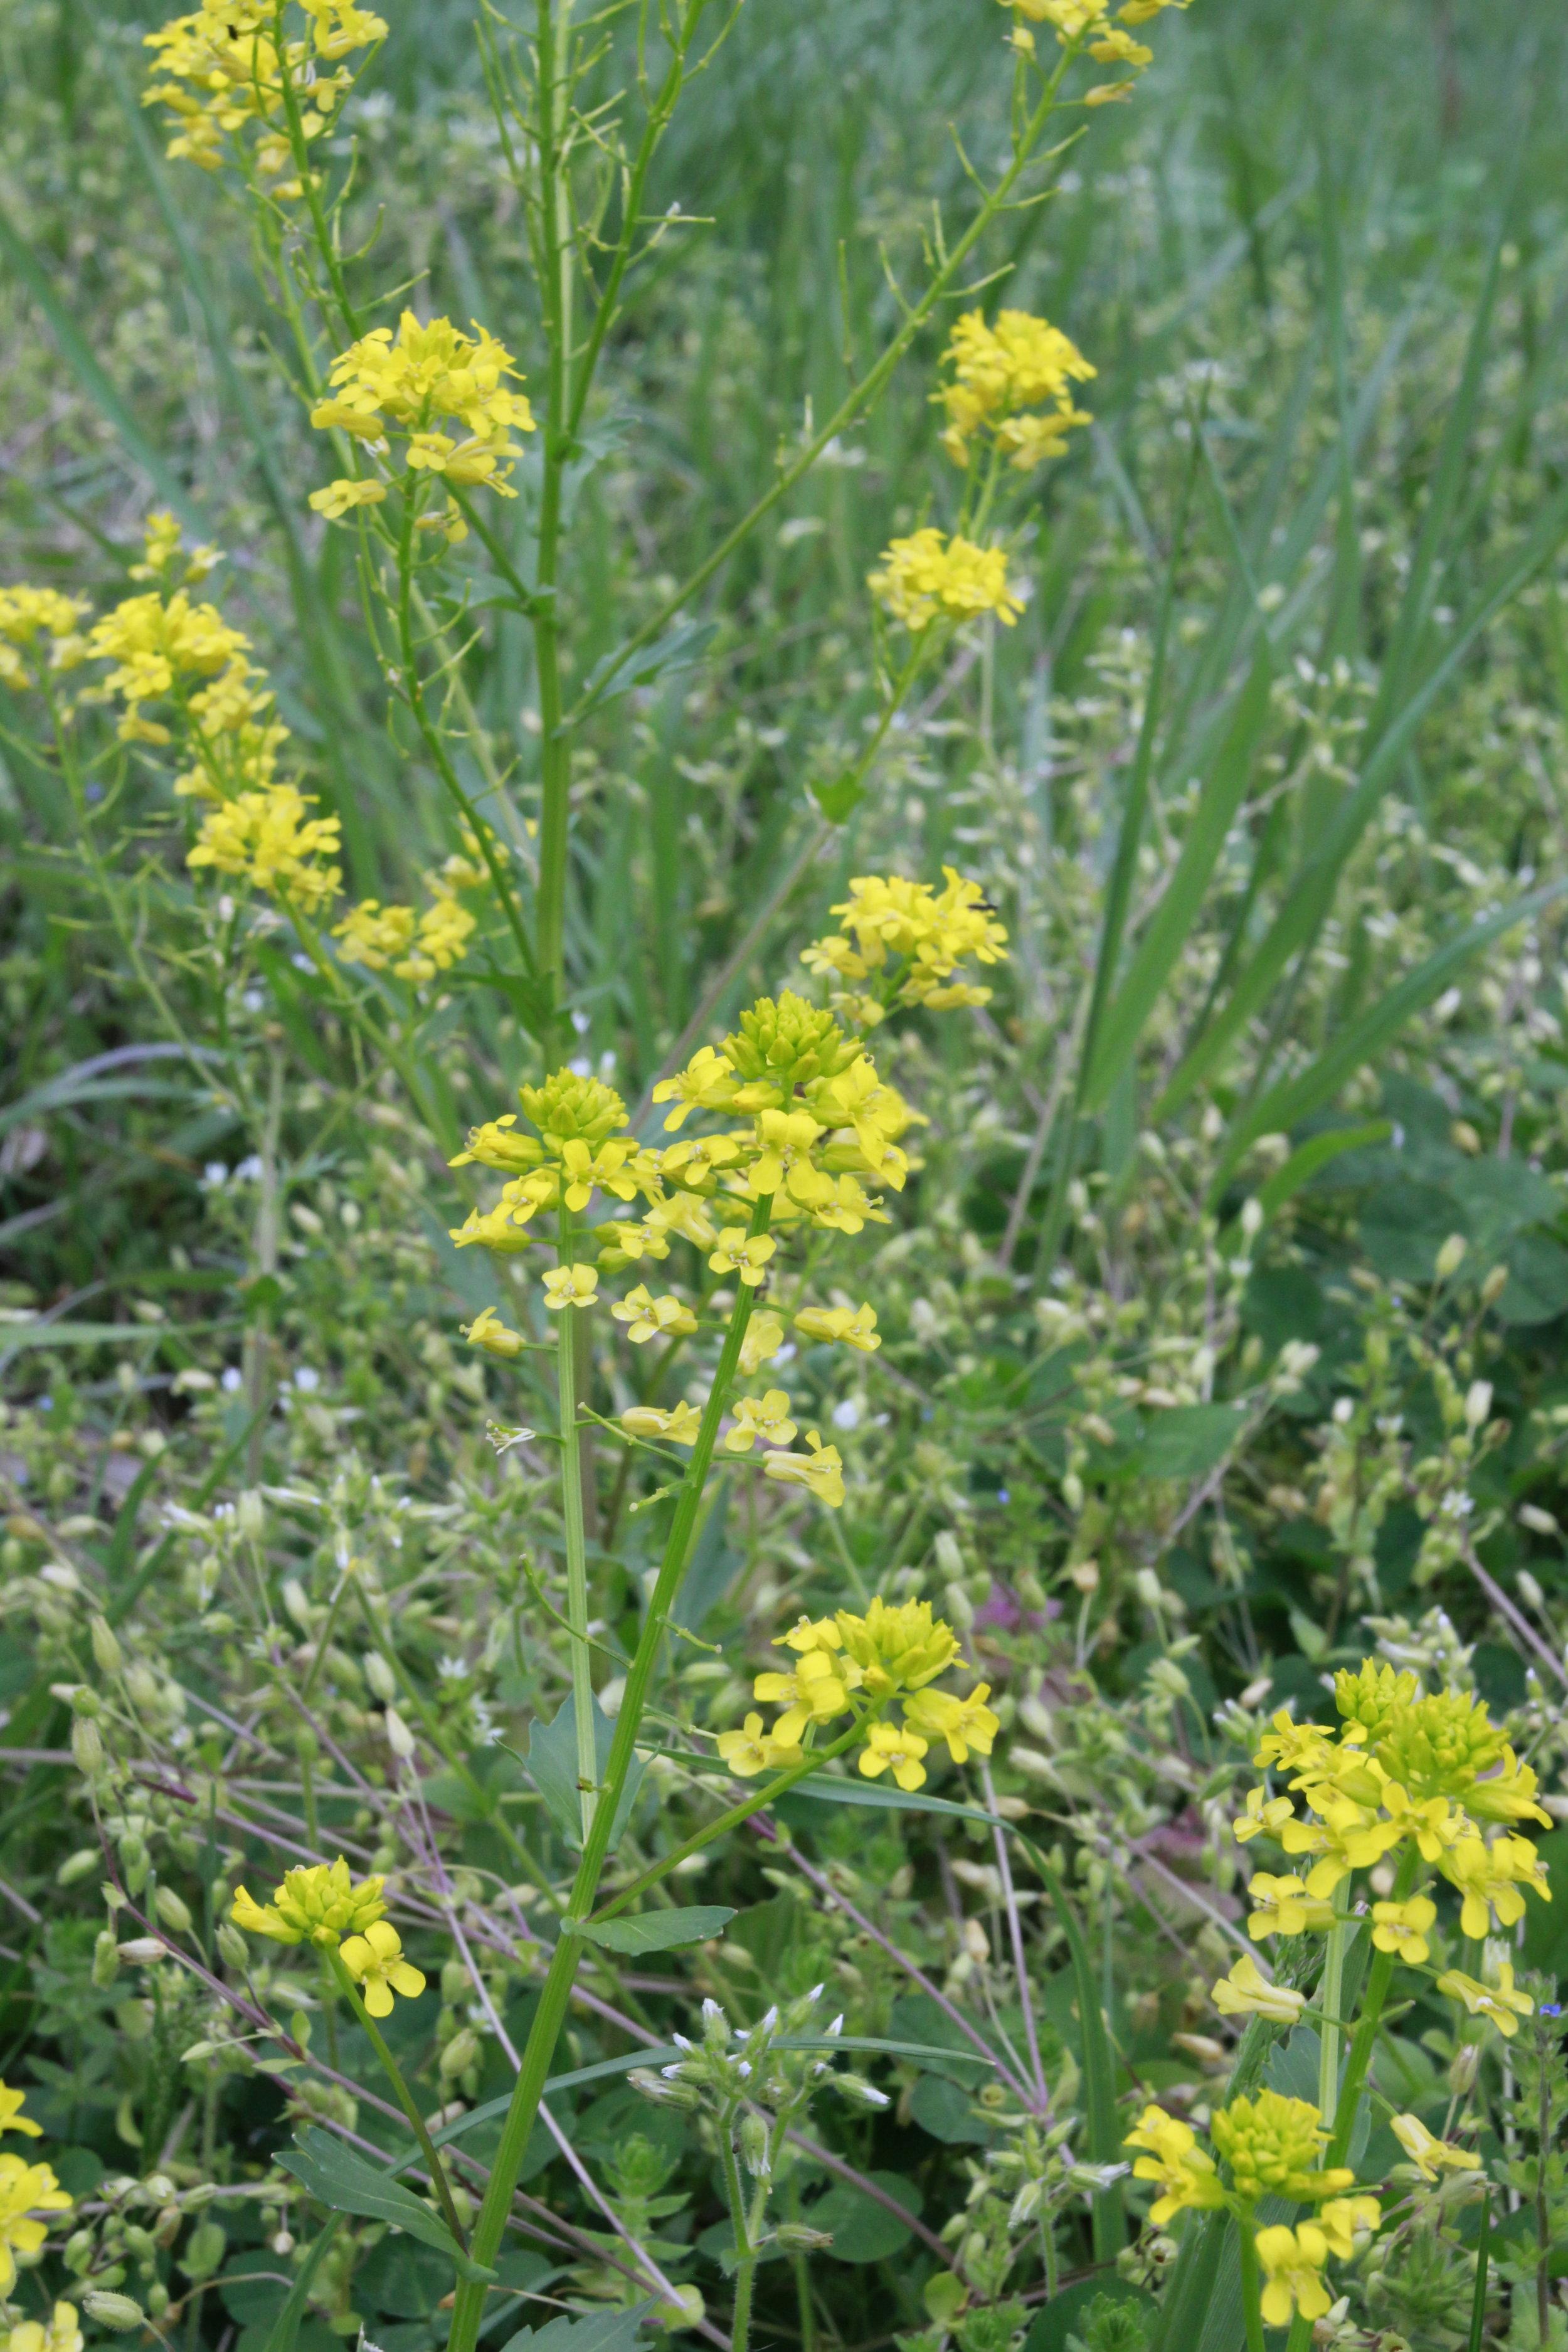 Yellow rocket,  Barbarea vulgaris.